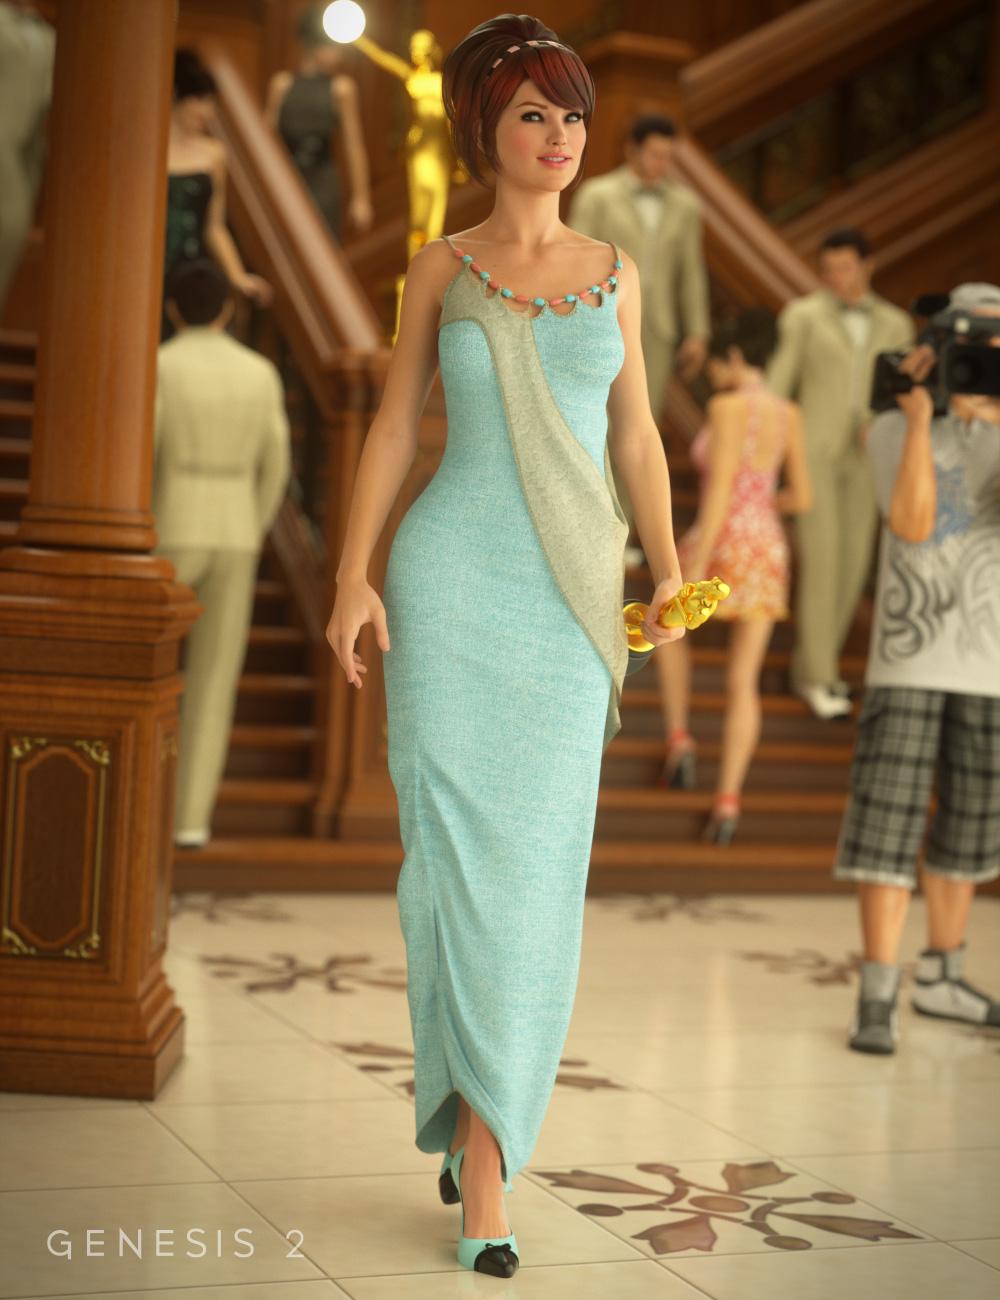 Corvidae Dress for Genesis 2 Female(s) by: MadaSarsa, 3D Models by Daz 3D